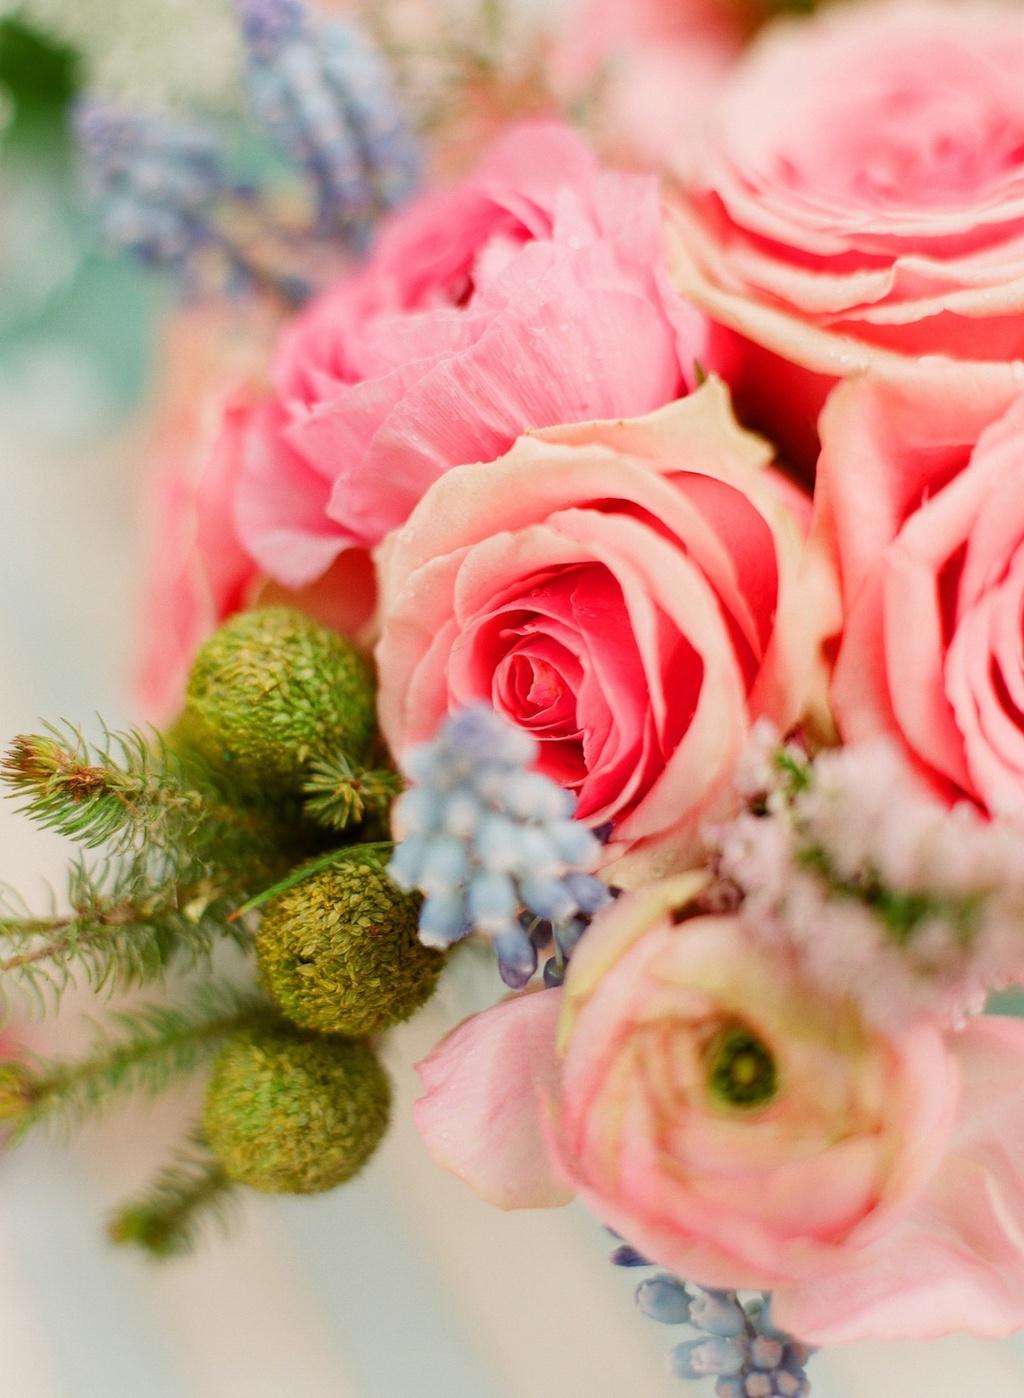 Romantic-wedding-details-outdoor-weddings-pink-green-centerpiece.full